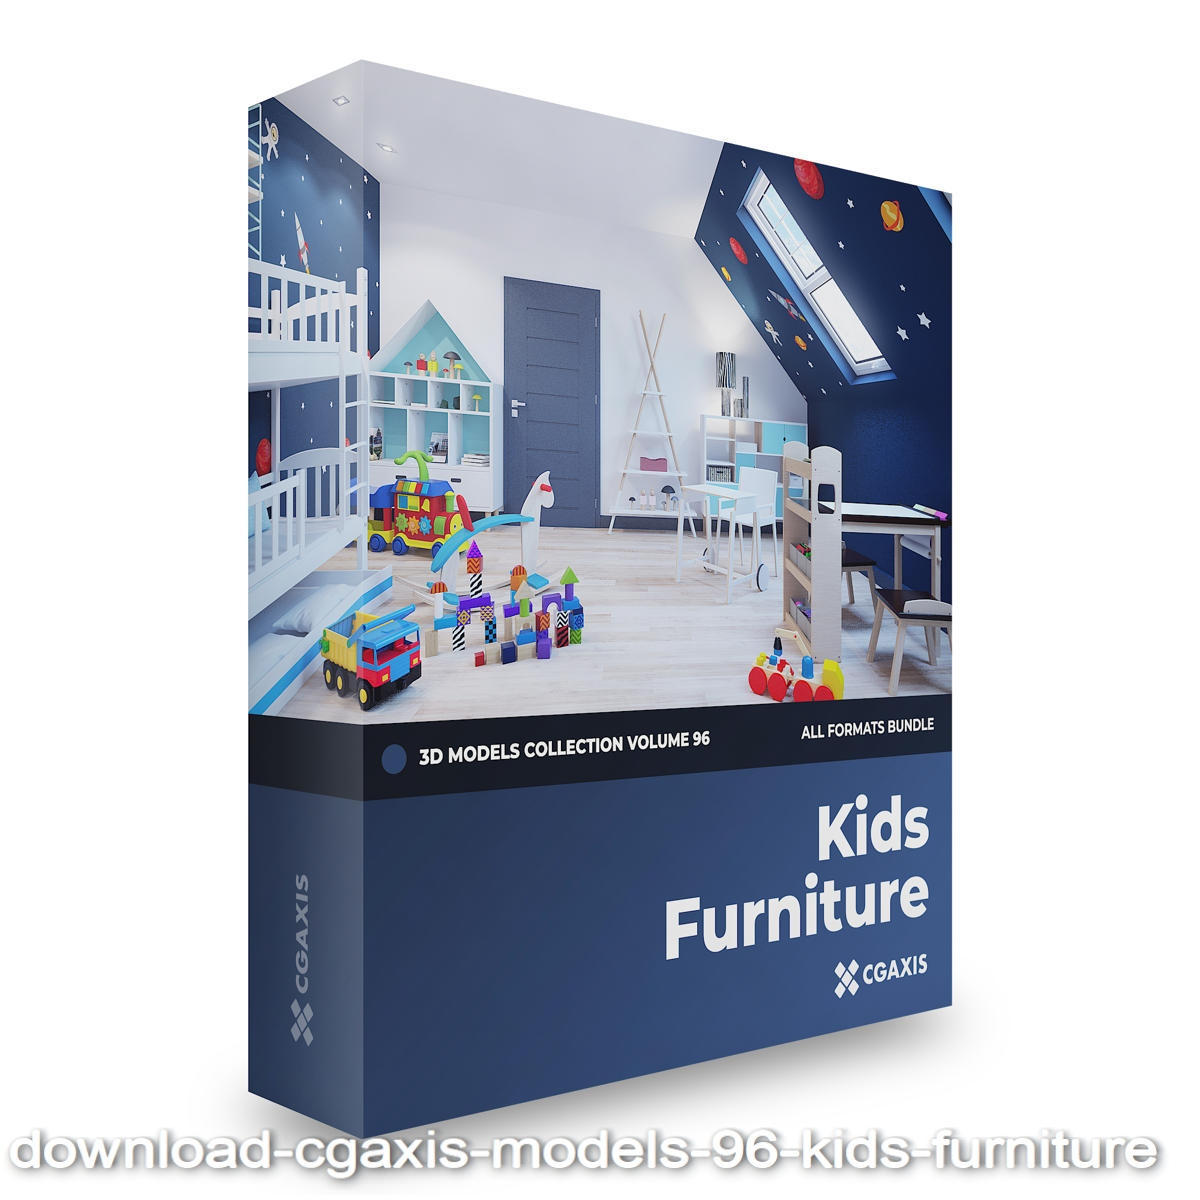 Download CGAxis Models Volume 96 Kids Furniture